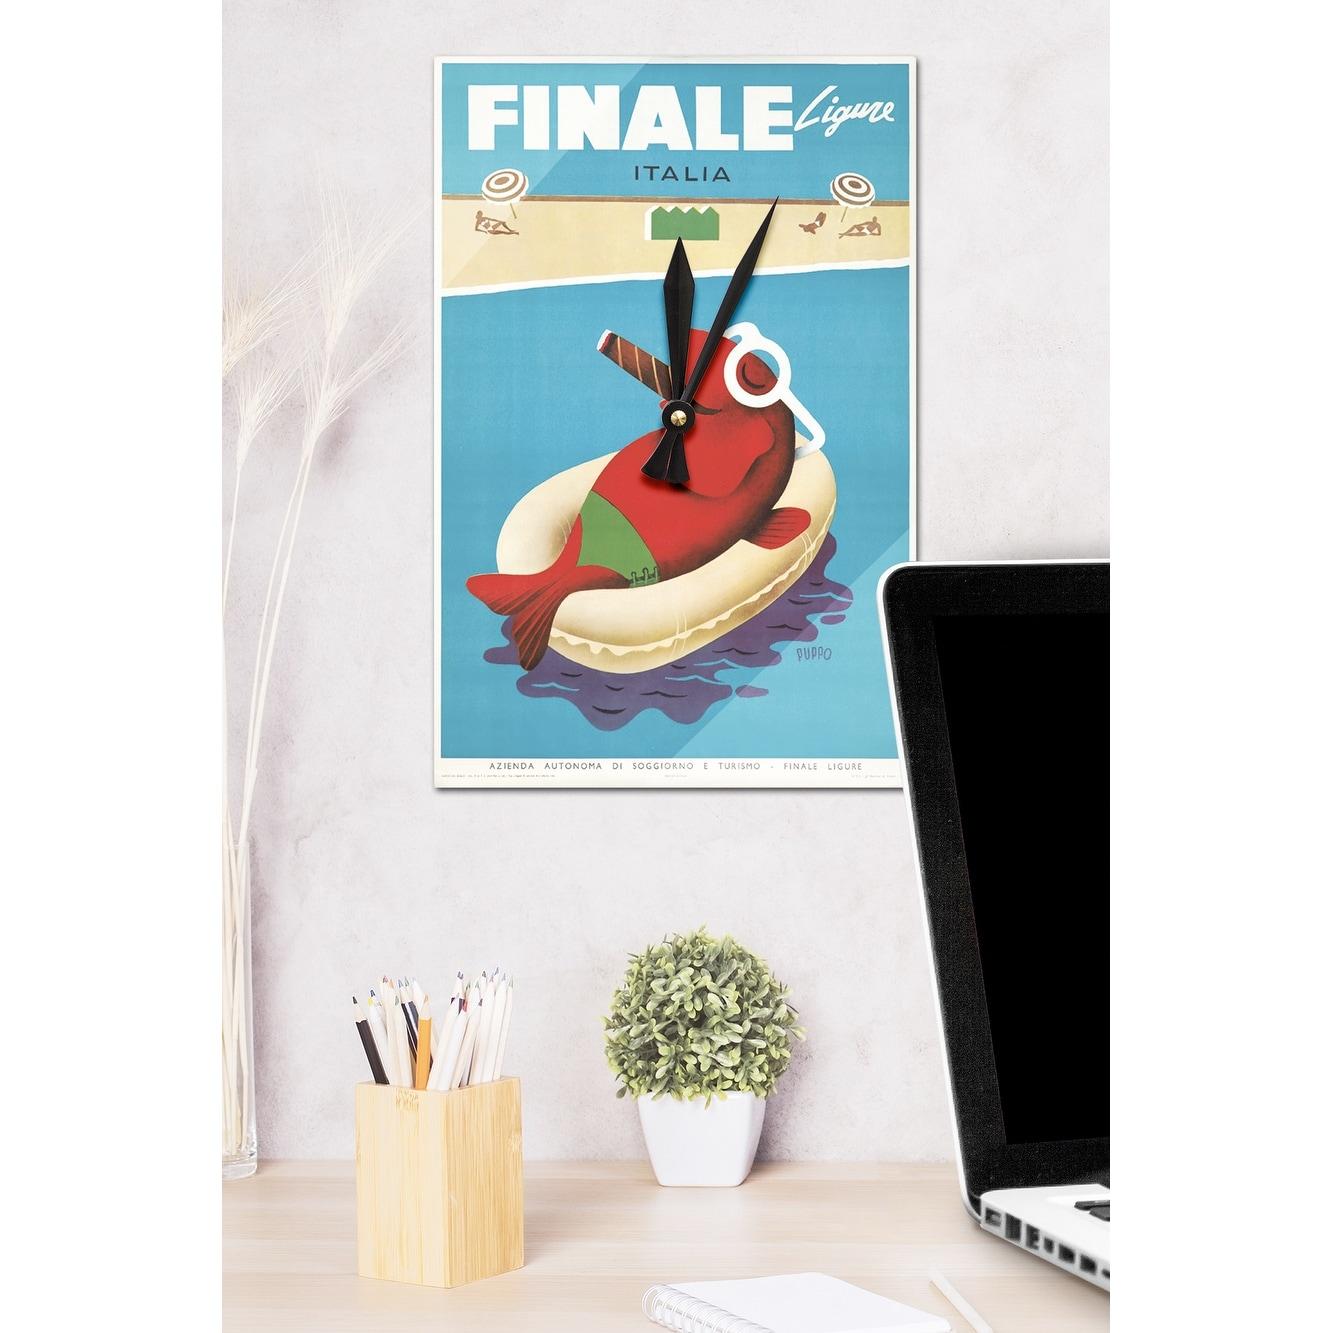 Finale Ligure (Puppo) c. 1950 - Vintage Poster (Acrylic Wall Clock ...